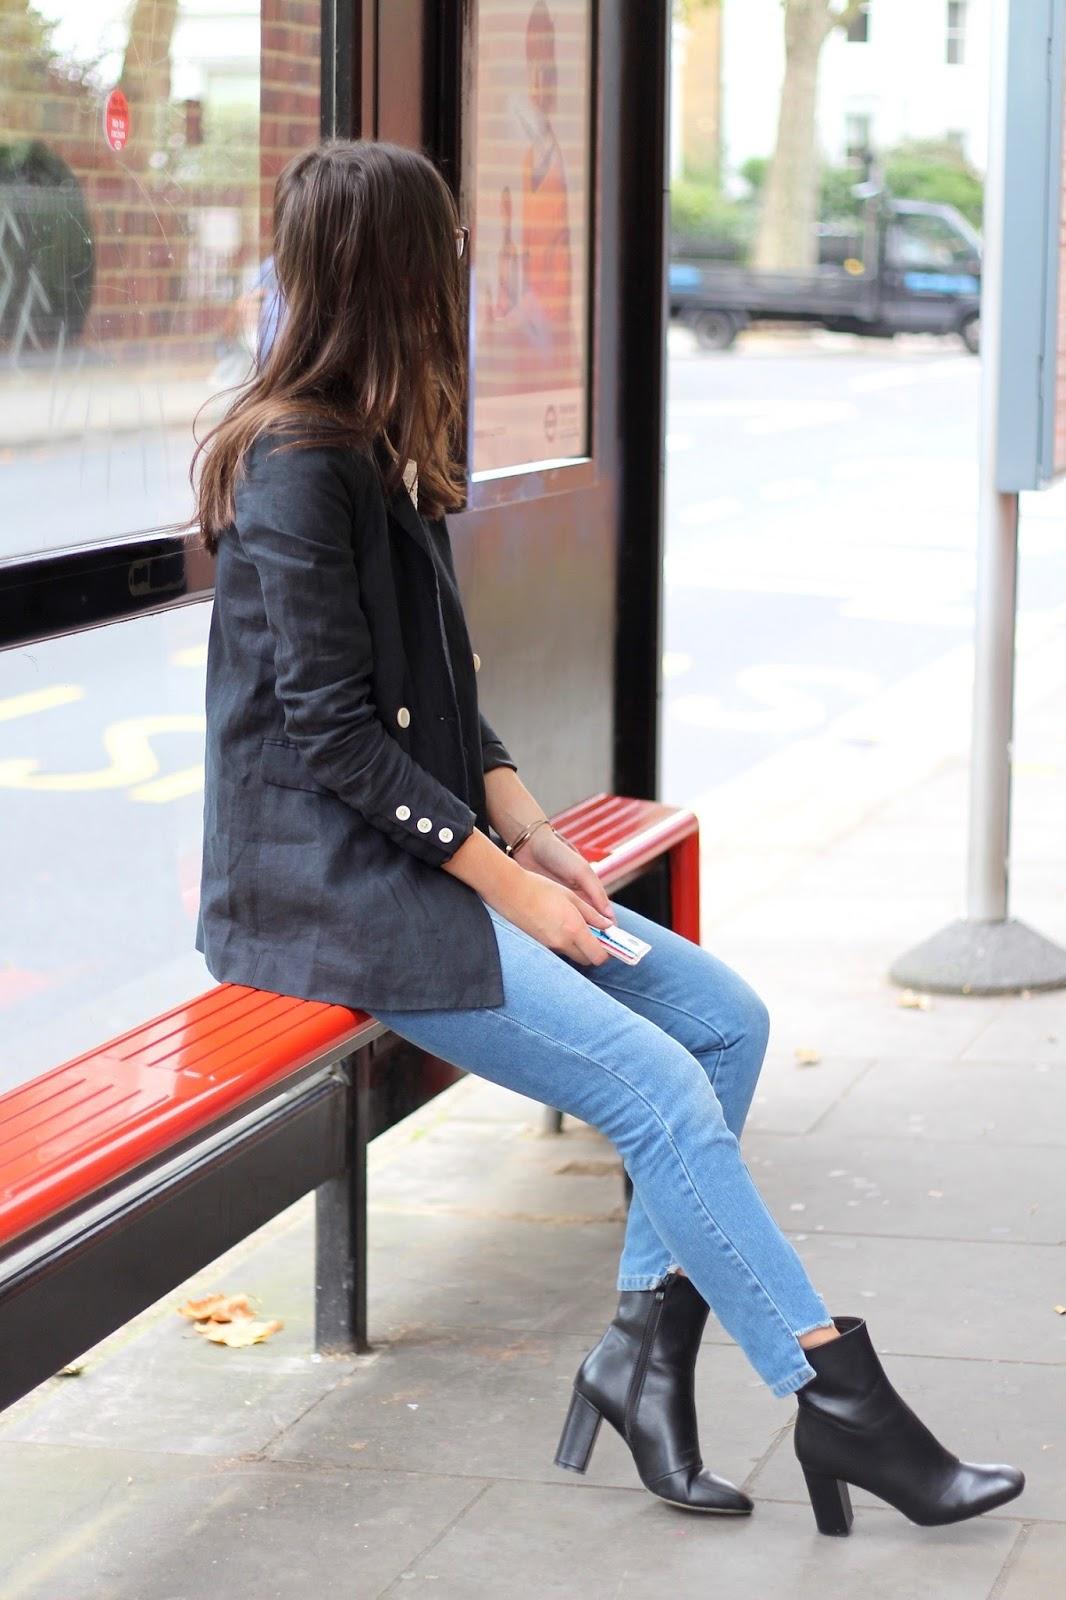 peexo london street style blogger